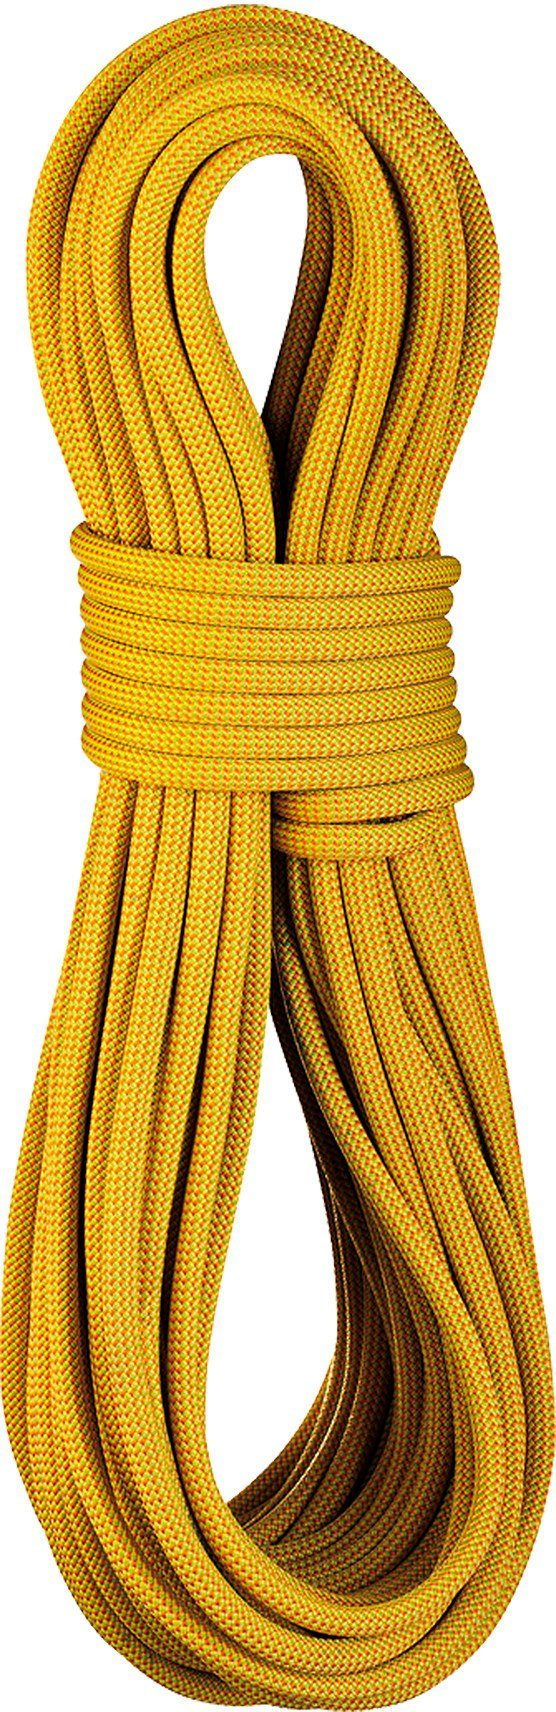 Edelrid Kletterseil »Kestrel Pro Dry Rope 8,5mm 50m«